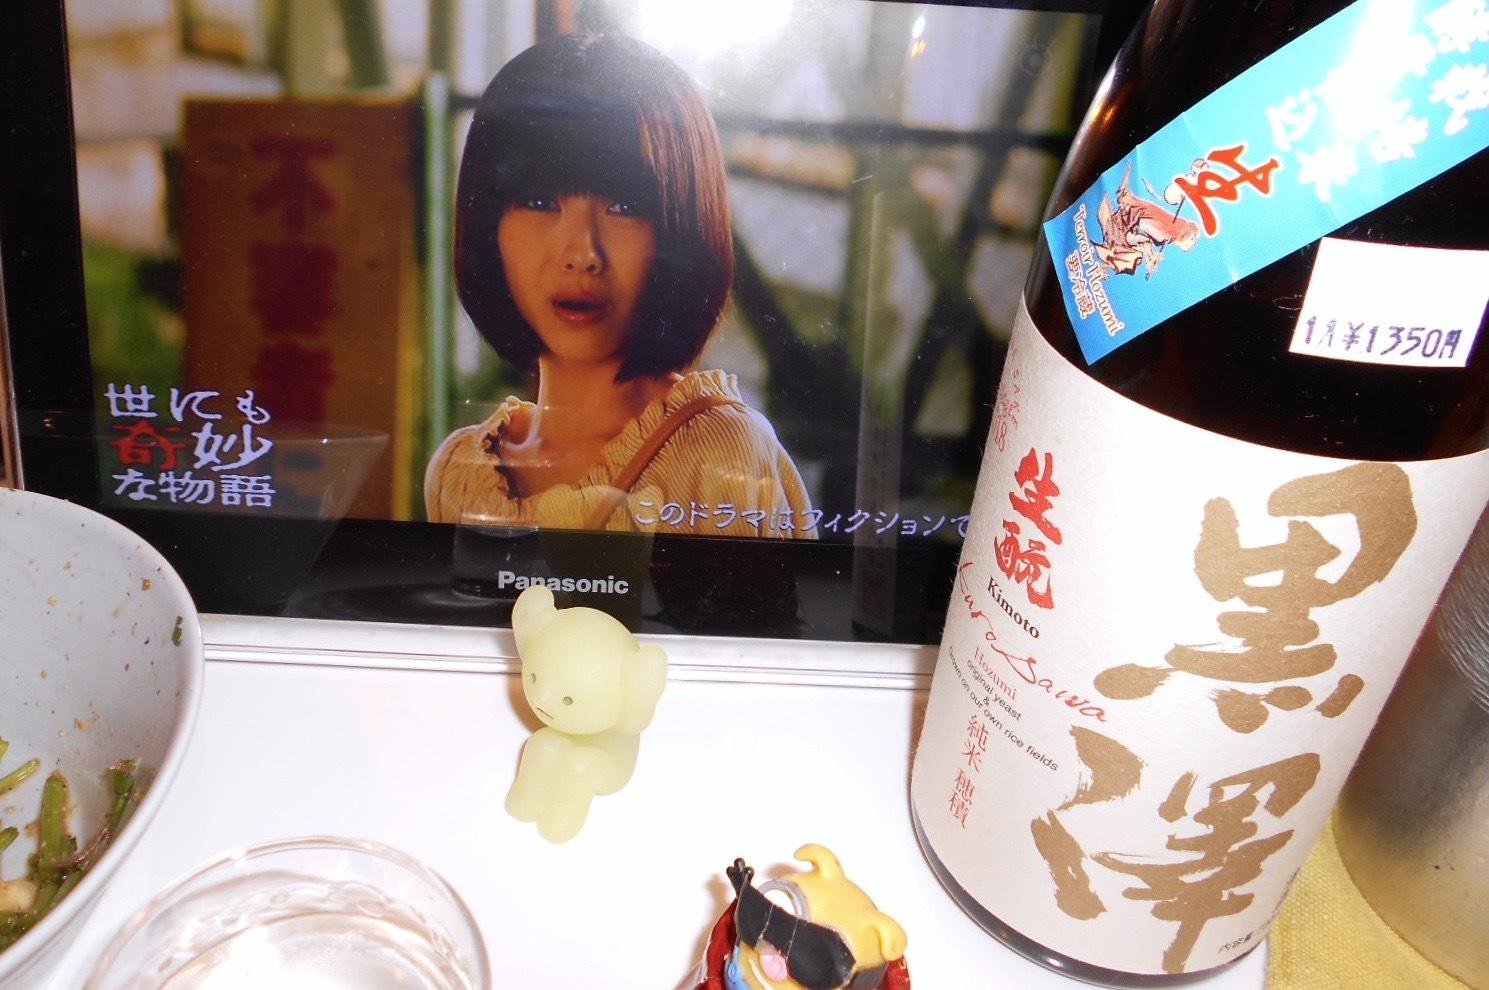 kurosawa_hozumi30by1_18.jpg